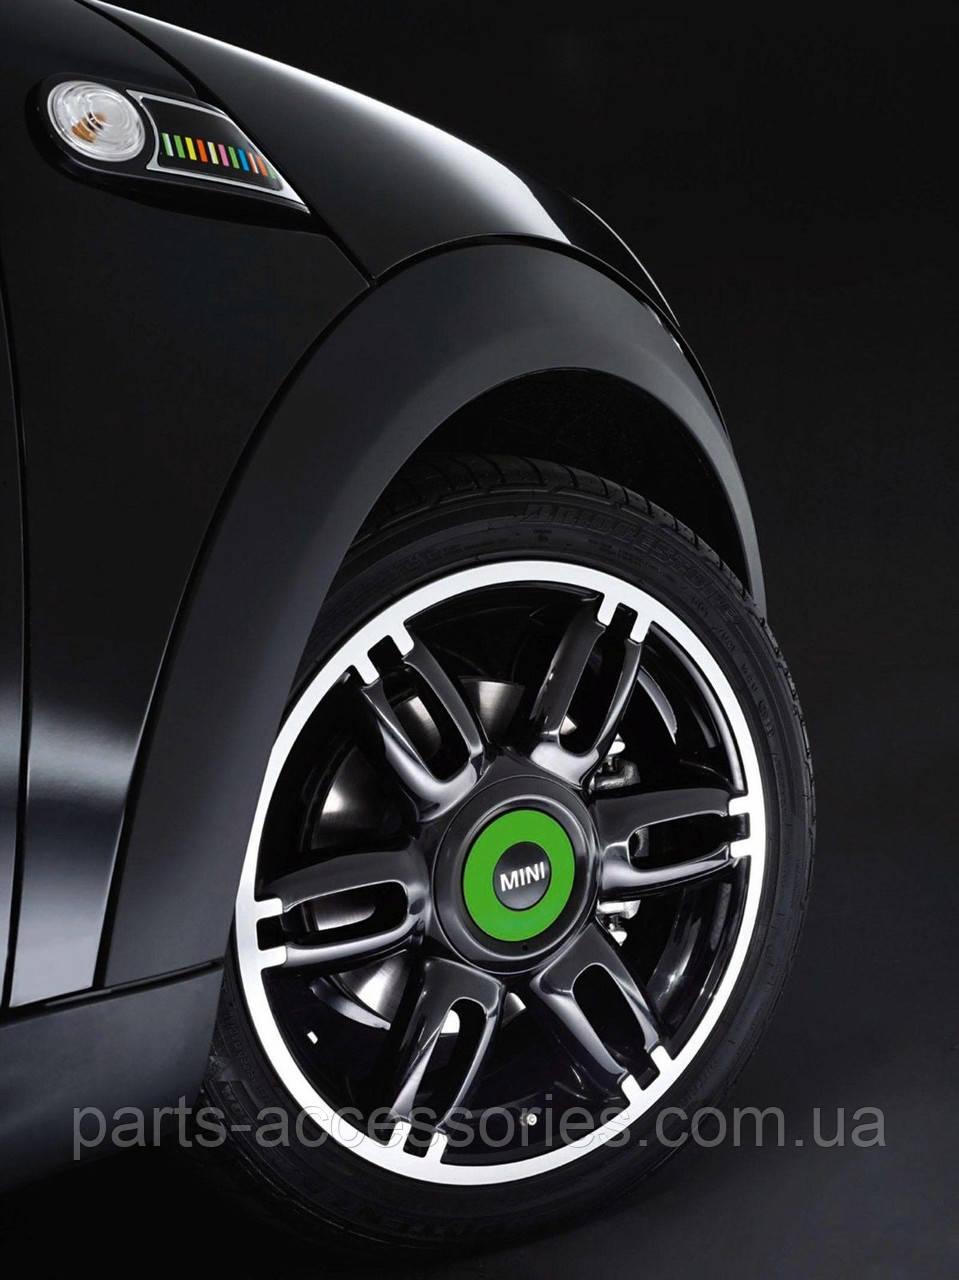 Mini Cooper R55 R56 R57 R58 R59 2007-15 зеленые колпачки в диски Новые Оригинальные